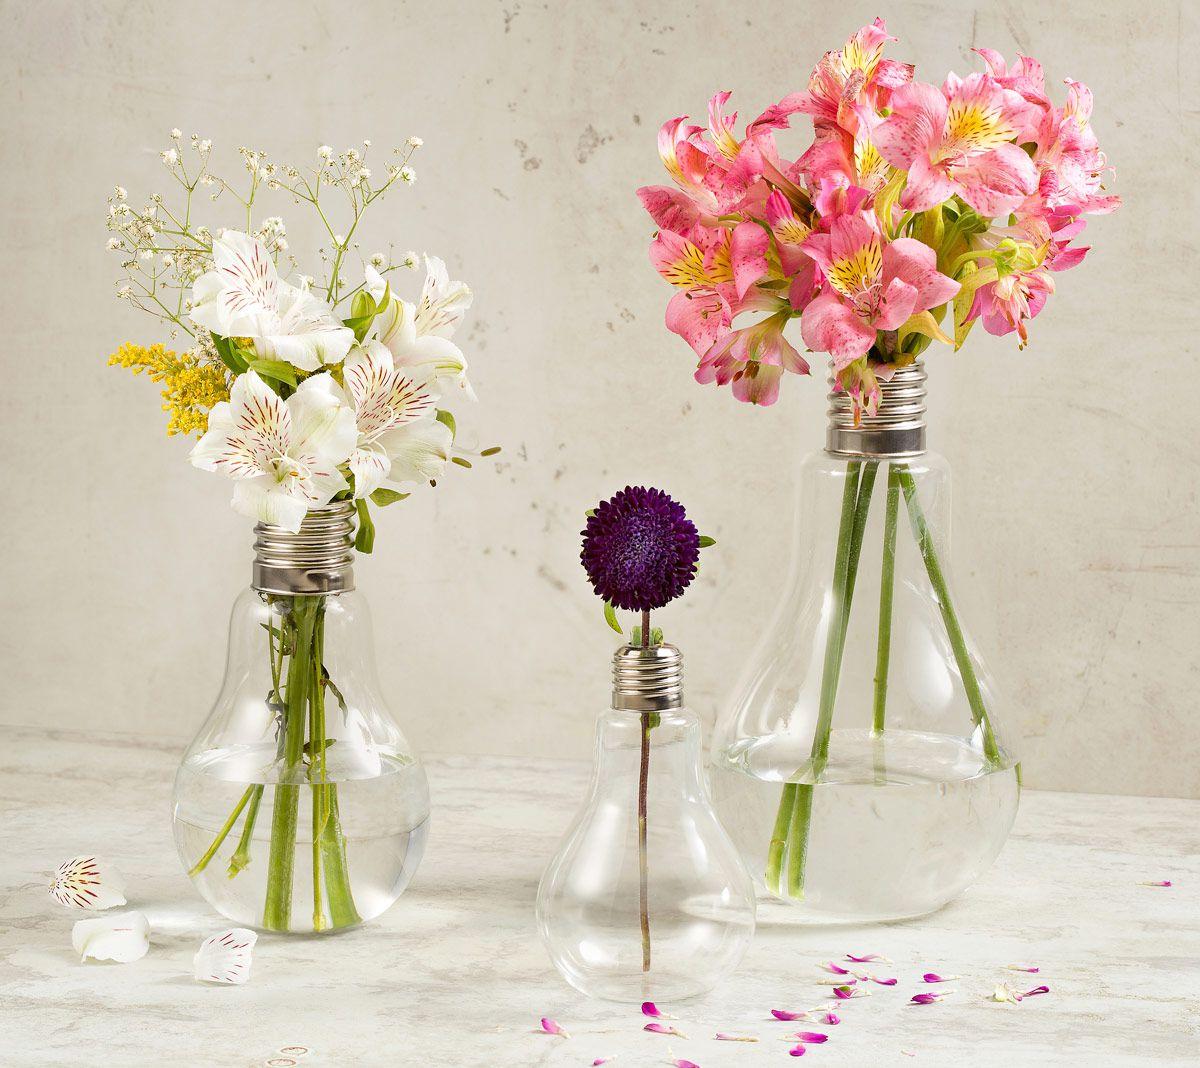 Vaso decorativo 10 cm de vidro transparente e metal Lâmpada Lyor - L3569